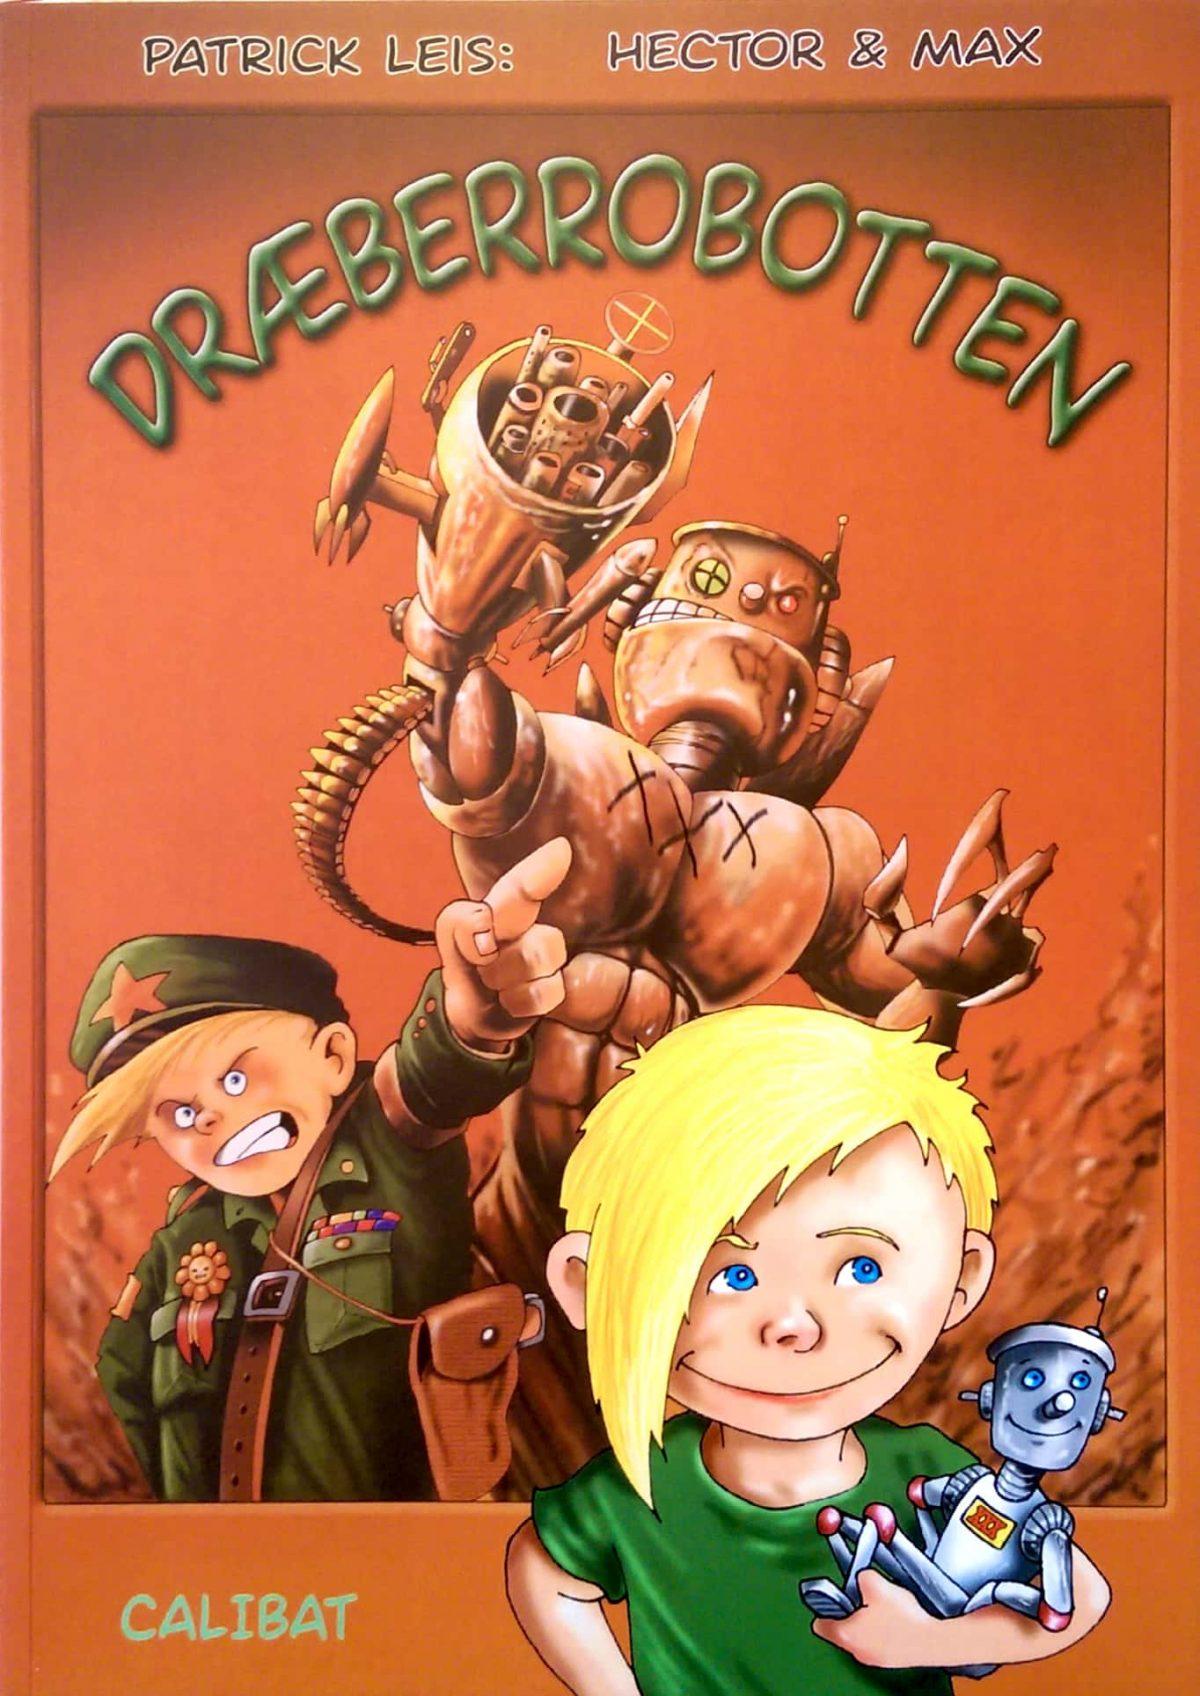 Draeberrobotten